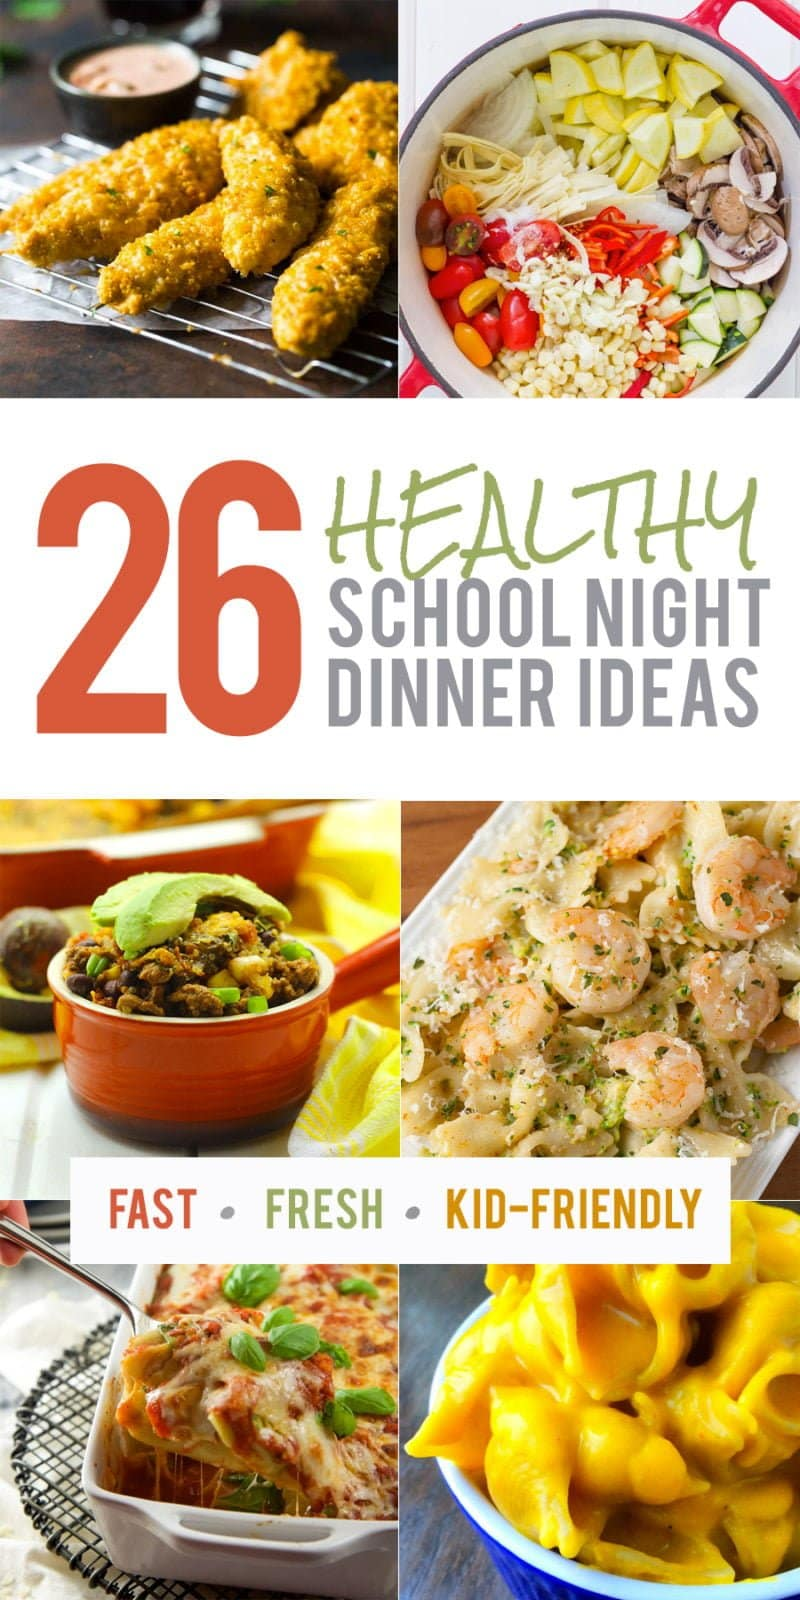 26 Healthy School Night Dinner Ideas